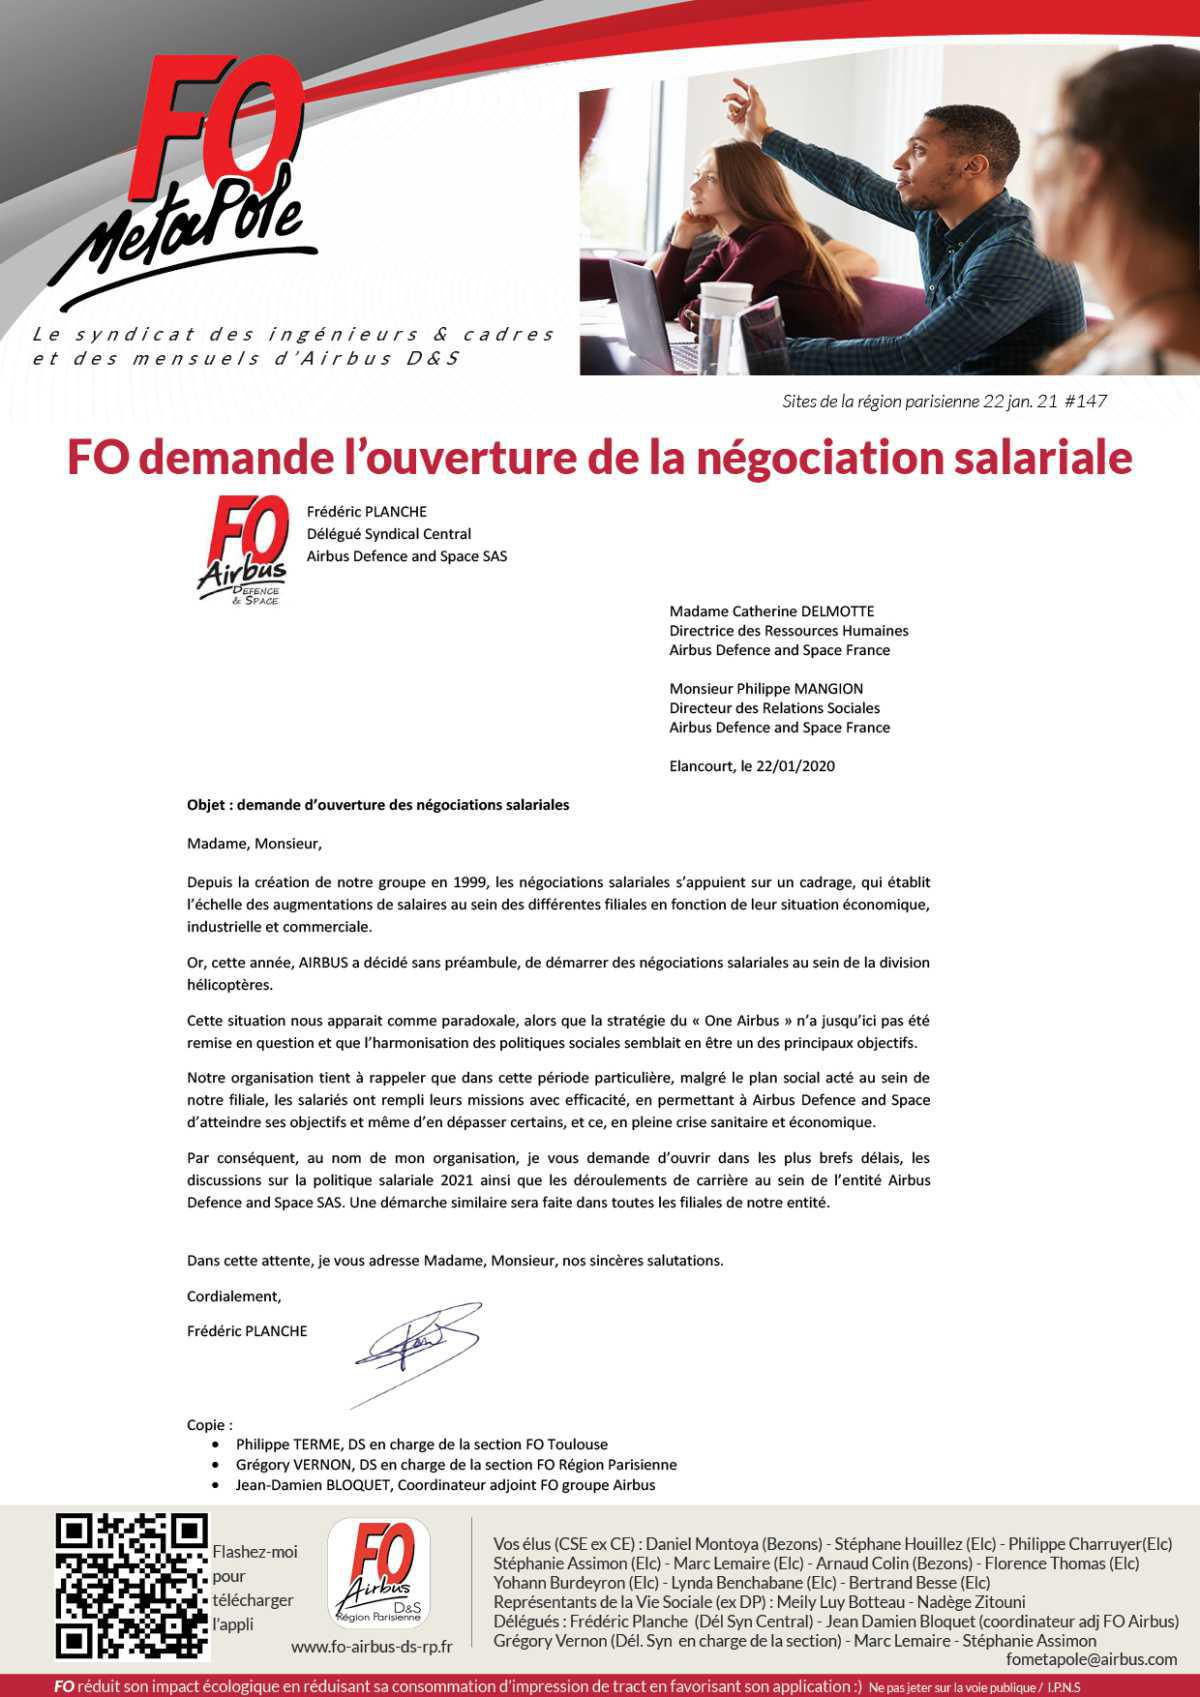 FO demande l'ouverture de la négociation salariale